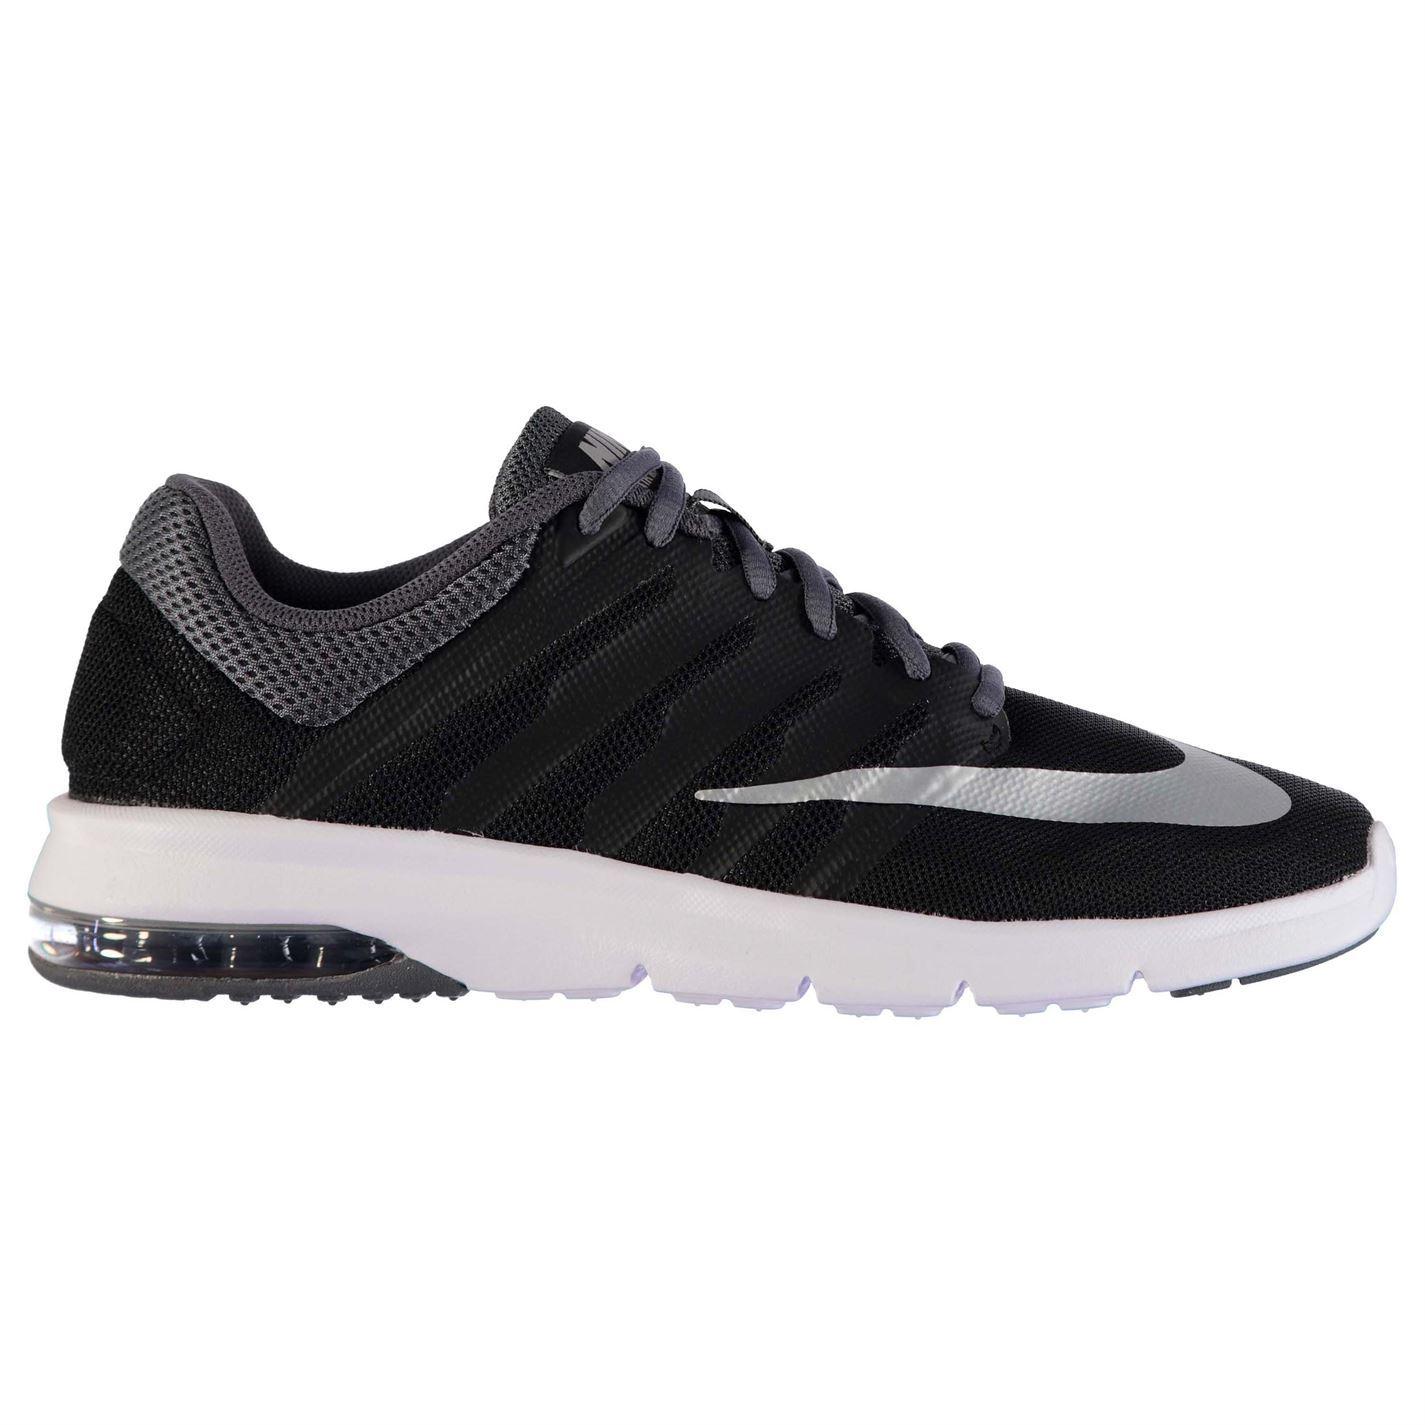 d4b1943bf27 Nike Air Tenis Max era Zapatillas para hombre Negro Plata Zapatos Tenis Air  Calzado Deportivo b7818c